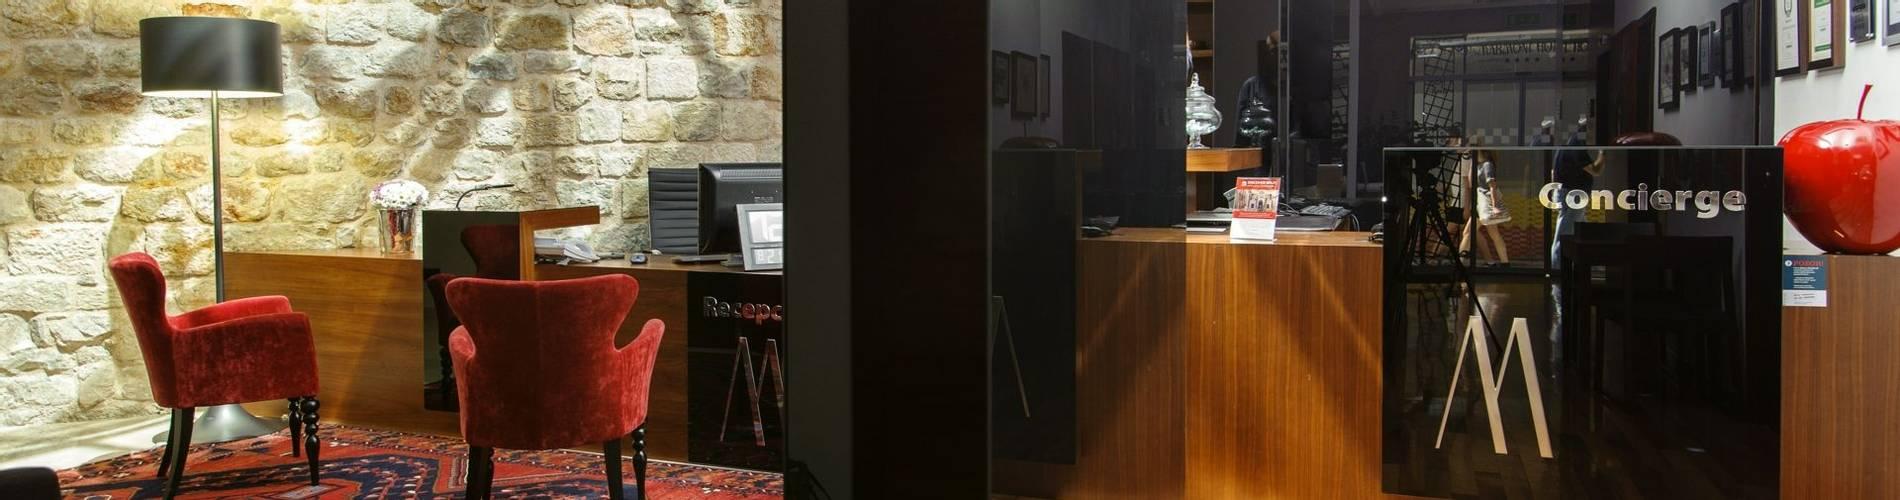 Reception-Heritage-Marmont-Completely-Croatia.jpg